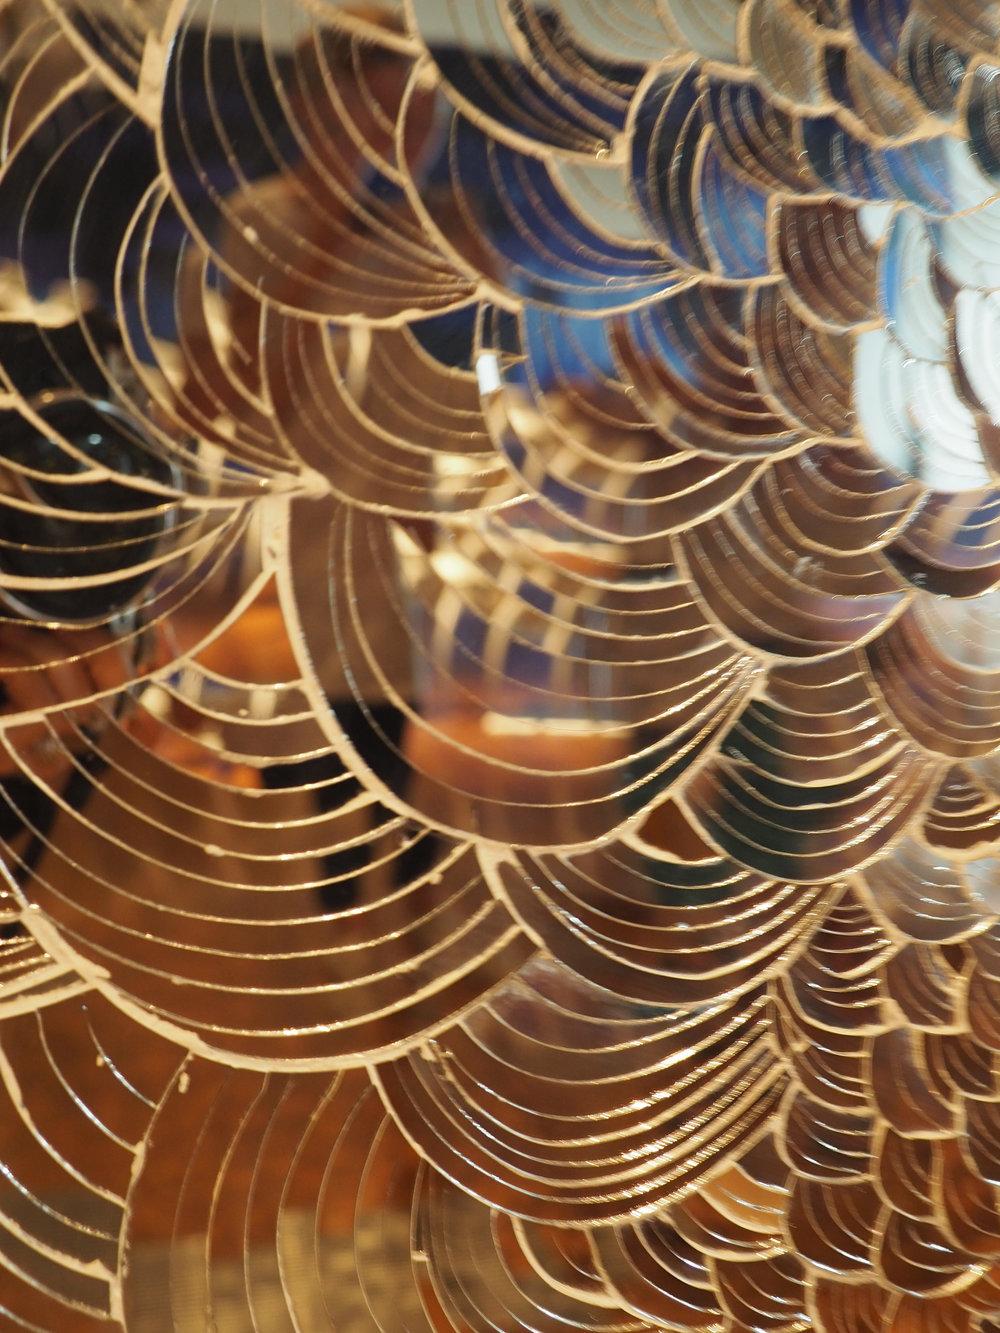 Goma Sugar Spin Ana Petre Terrene-3041792.jpg